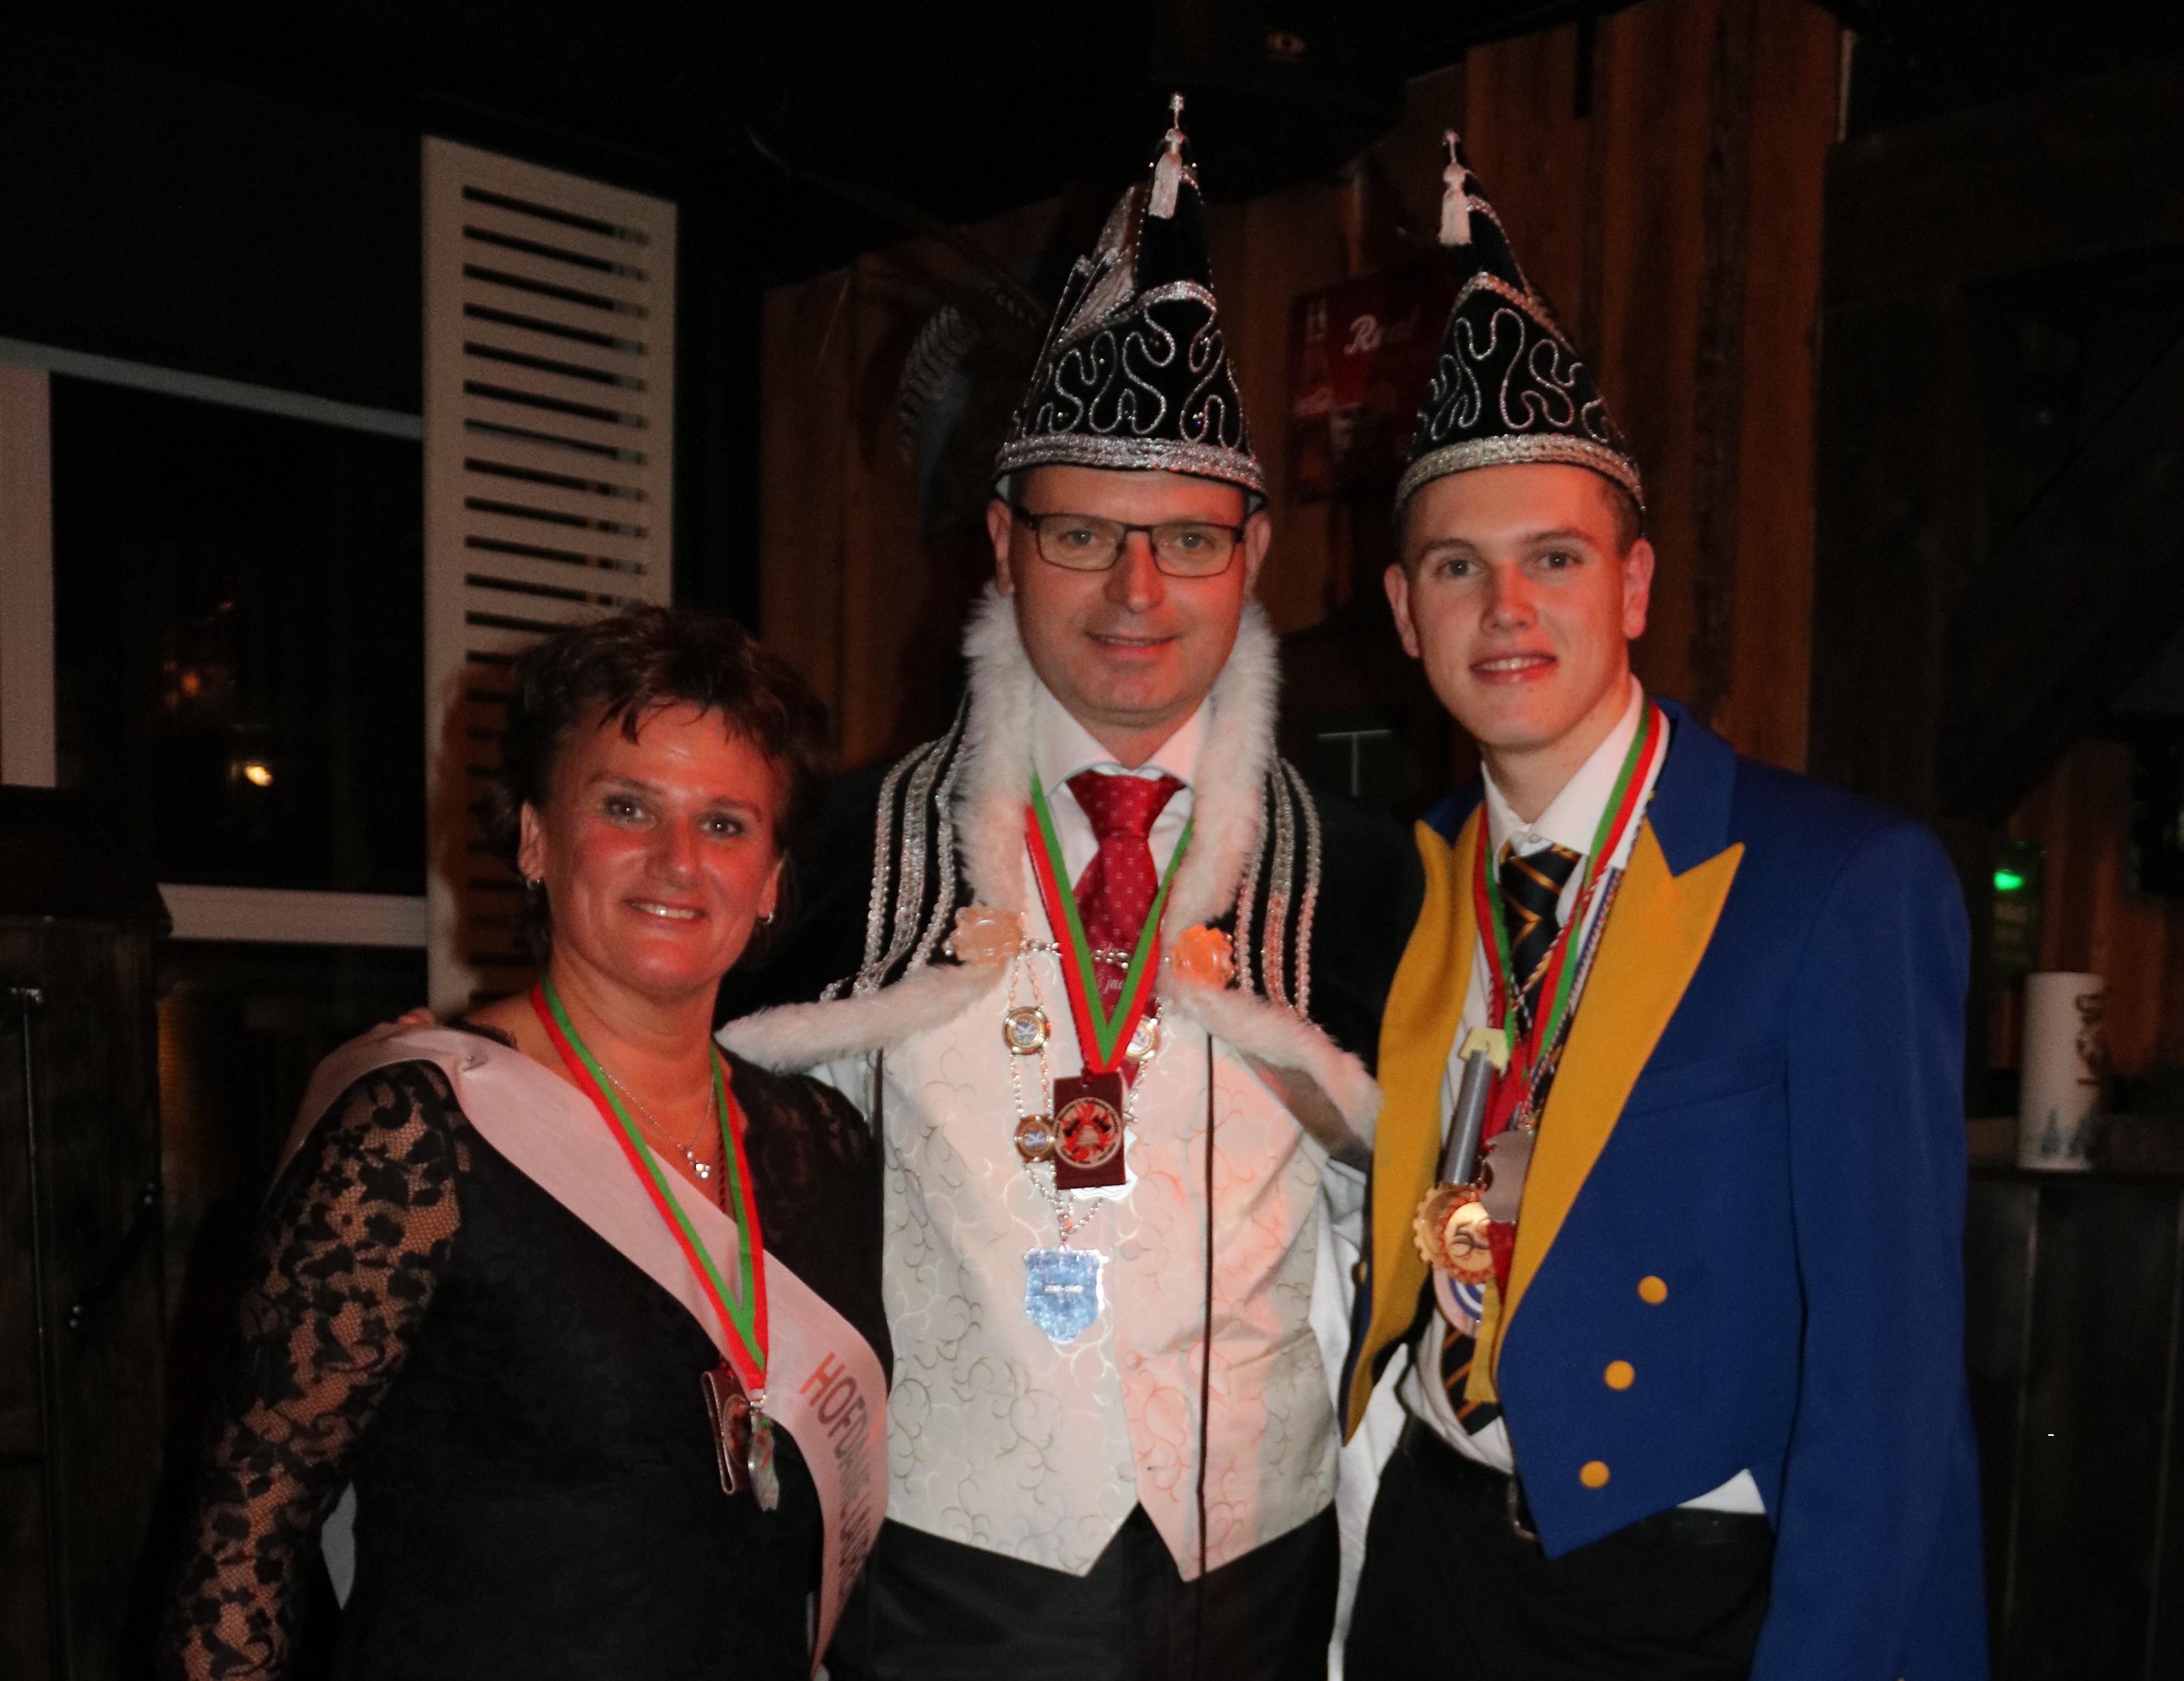 Hofdame Laurentia, prins Franciscus, en adjudant Nick vieren graag een feestje met iedereen die het carnaval een warm hart toedraagt. (Foto: Nancy Holderbeke)